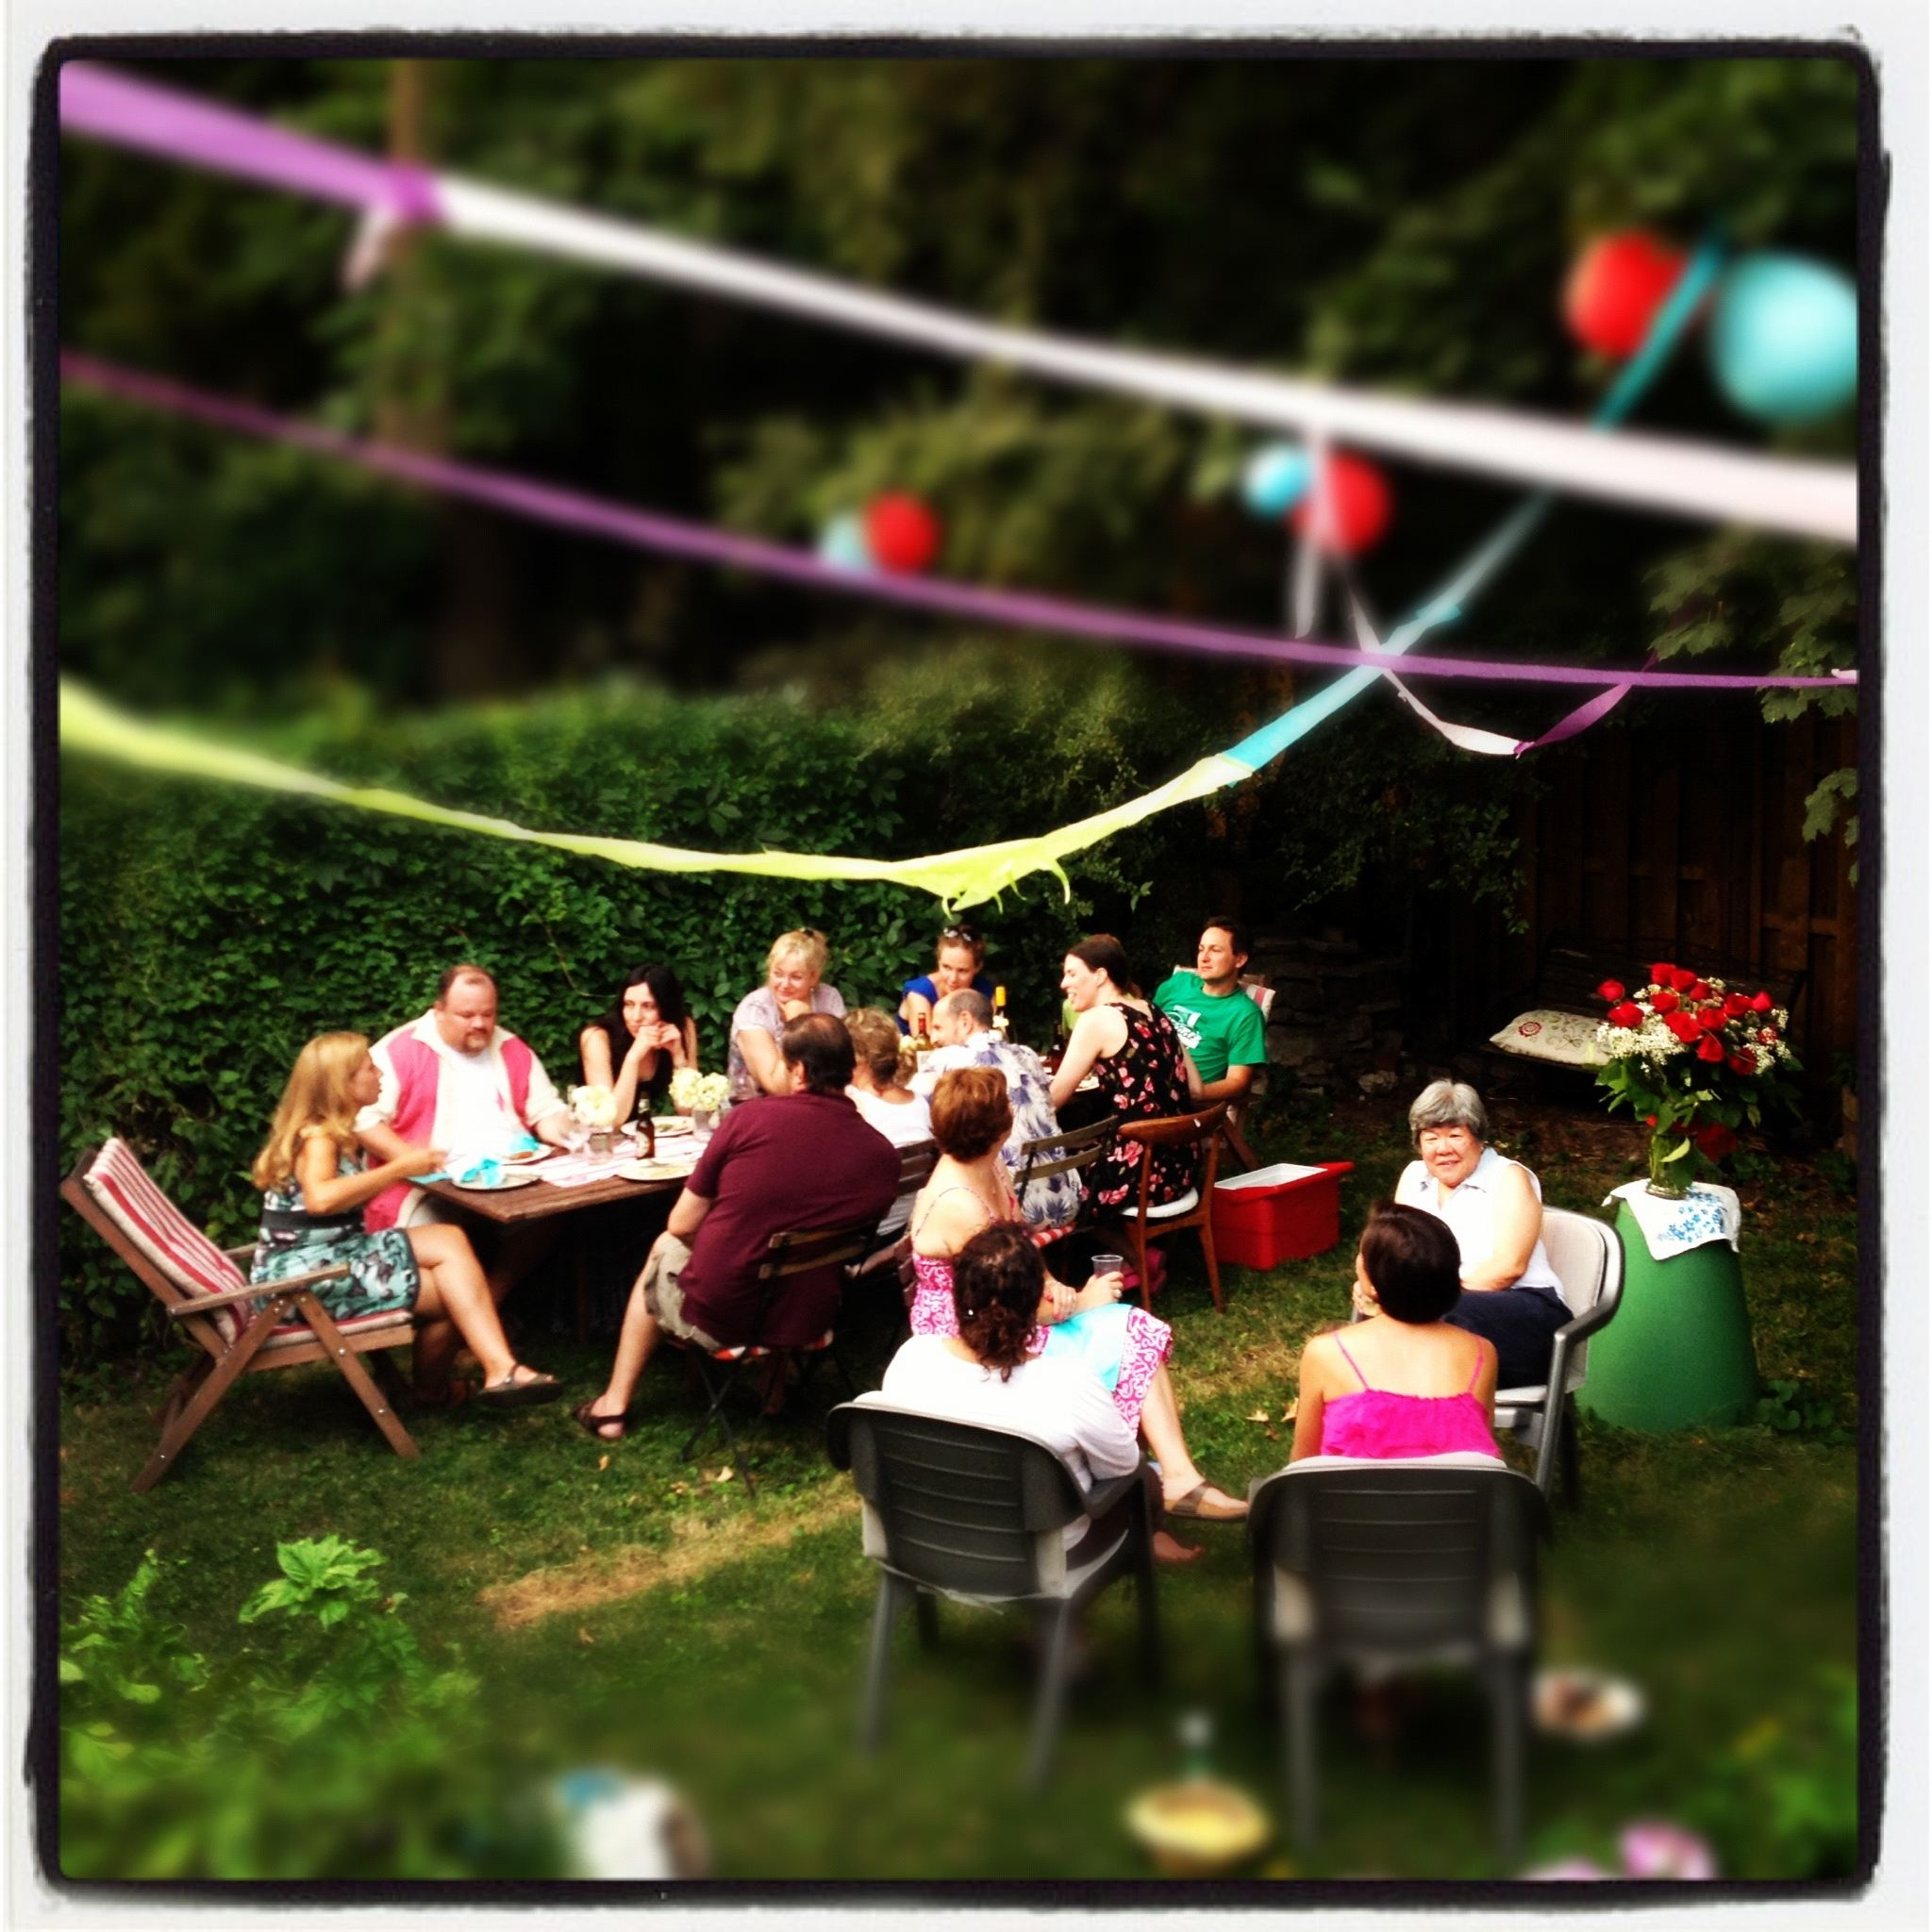 backyard party decorations wonderful backyard birthday party decorations backyard dinner party decorating ideas